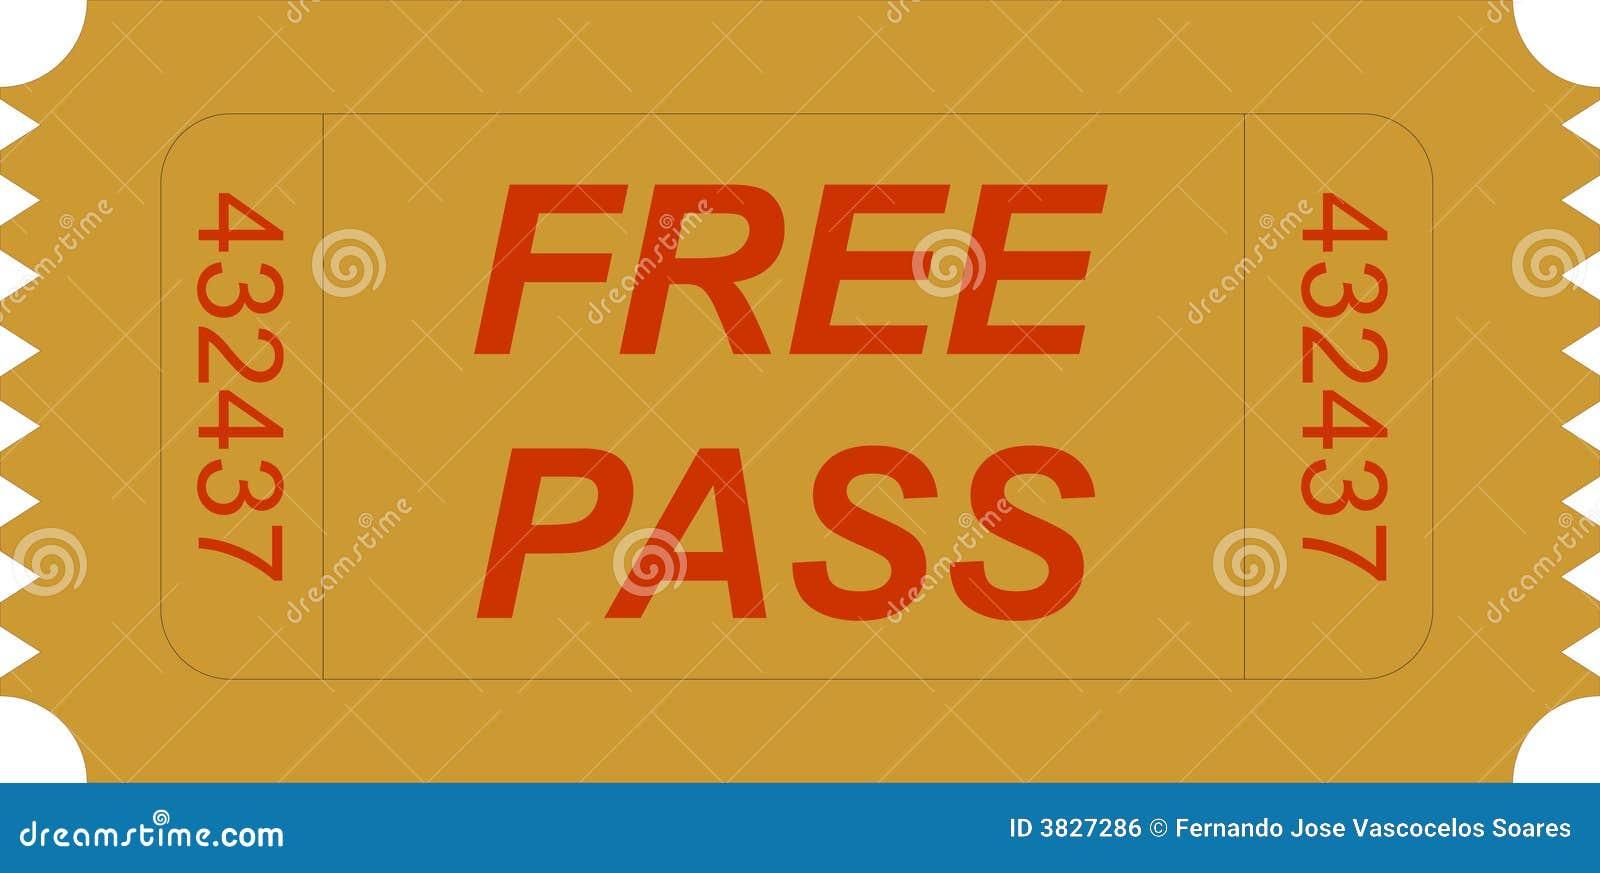 Ticket free pass royalty free stock image image 3827286